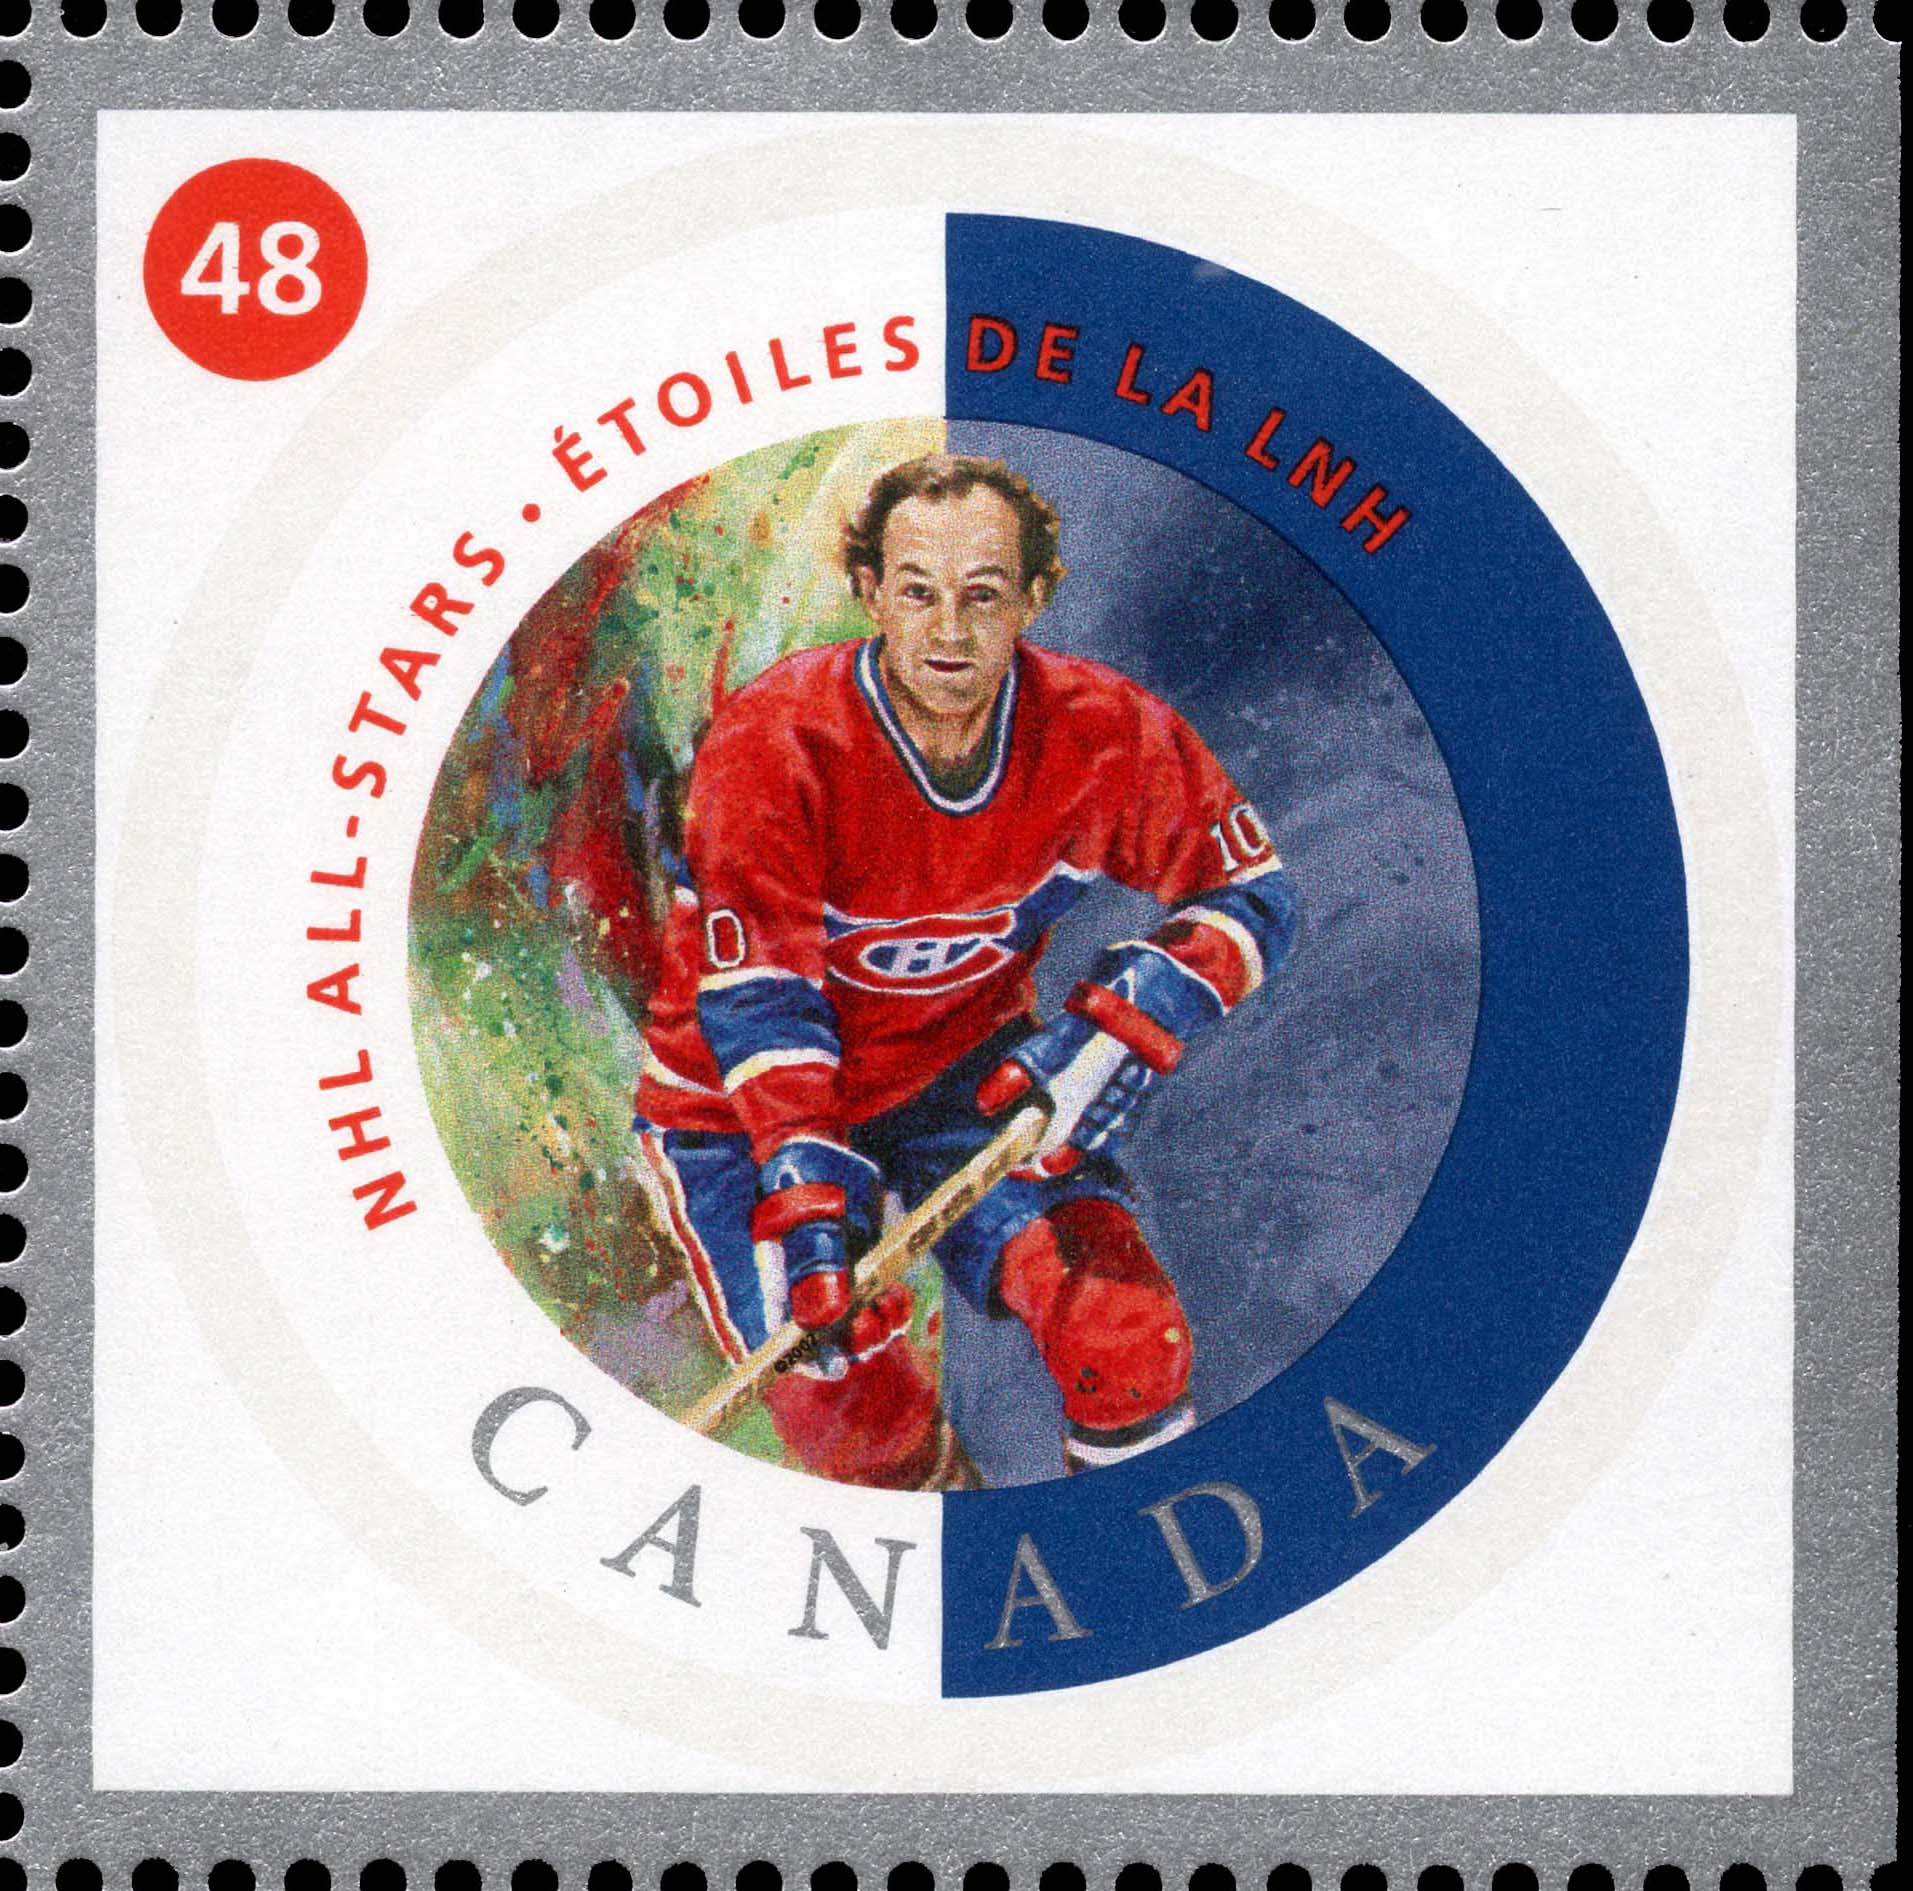 Guy Lafleur Canada Postage Stamp | NHL All-Stars